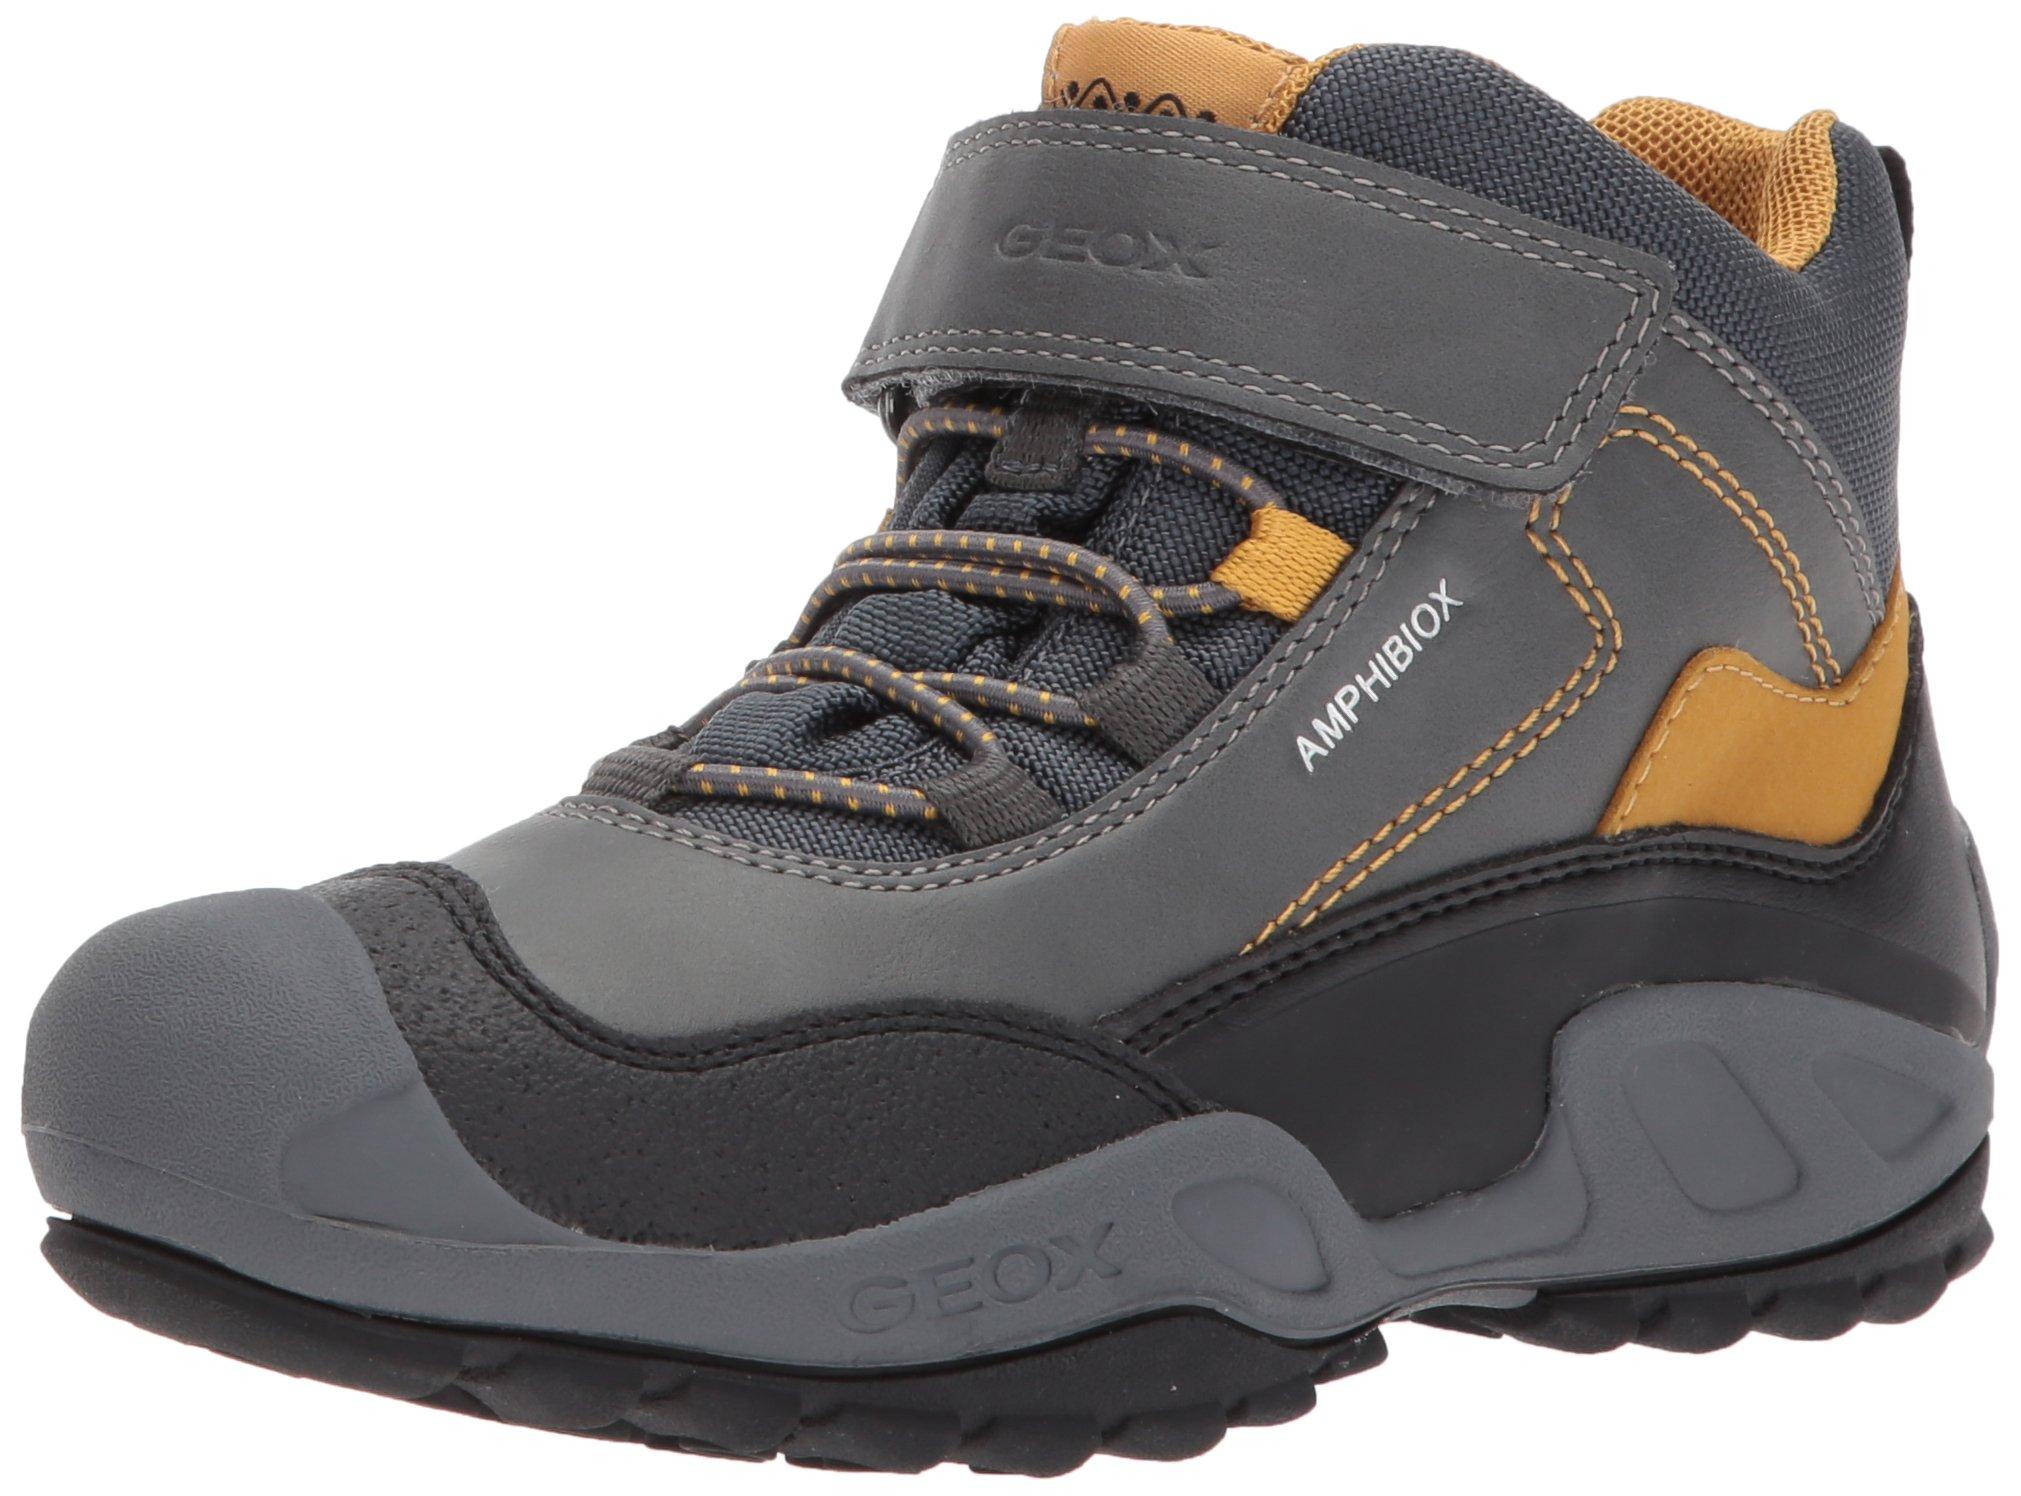 Geox Boys' New Savage Abx 4 Ankle Boot, Grey/Dark Yellow, 41 M EU Big Kid (7 US) by Geox